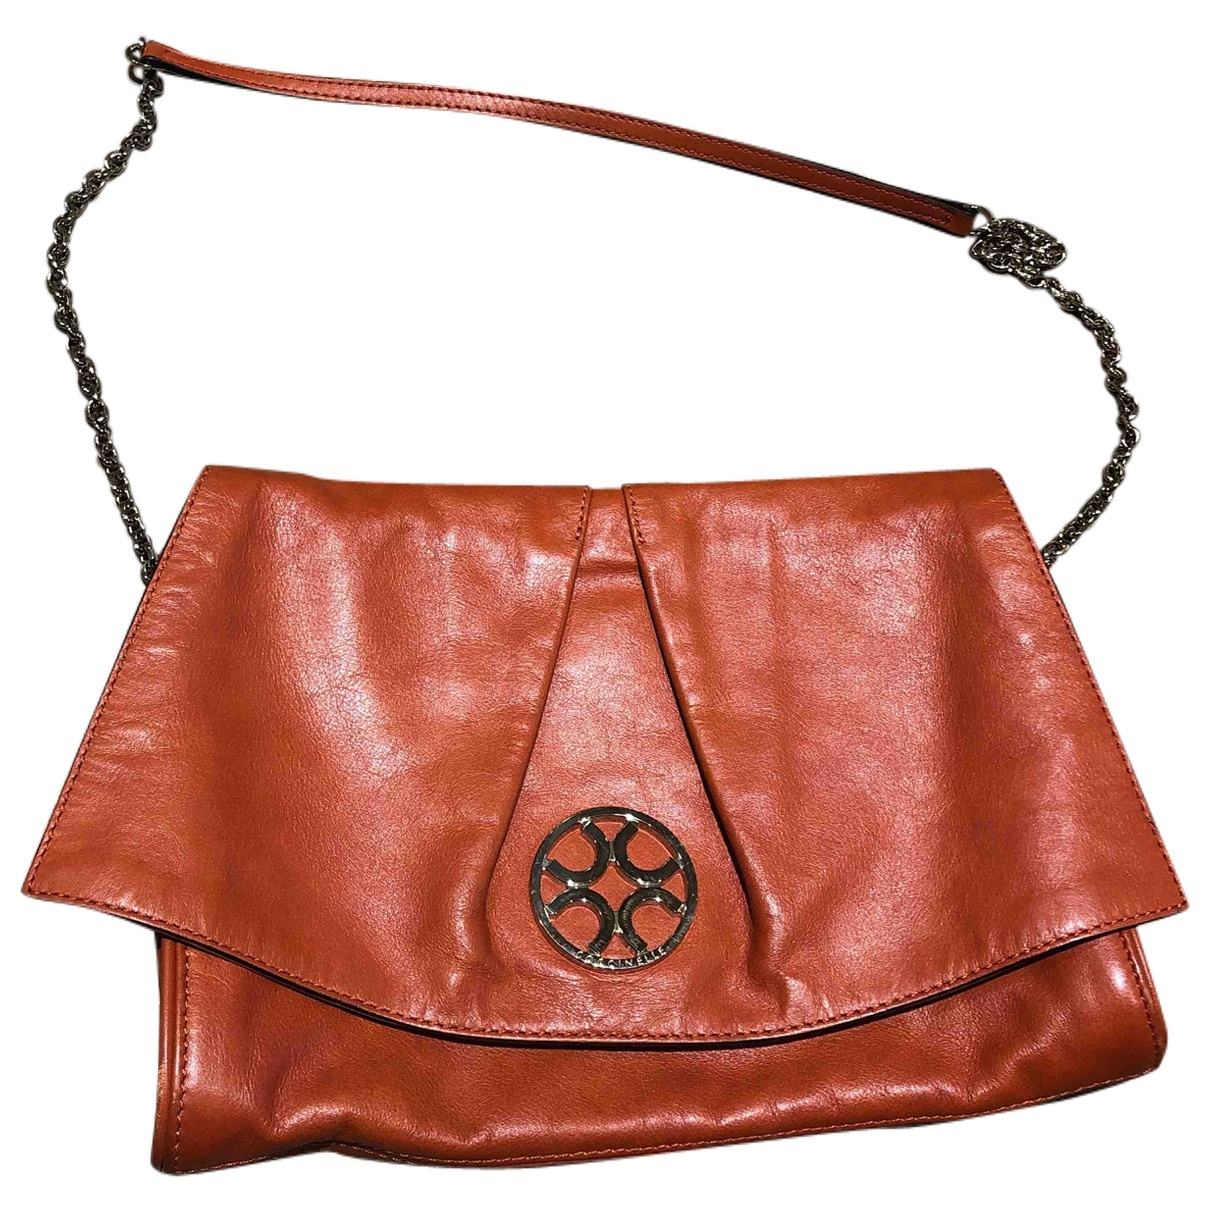 Coccinelle \N Orange Leather handbag for Women \N